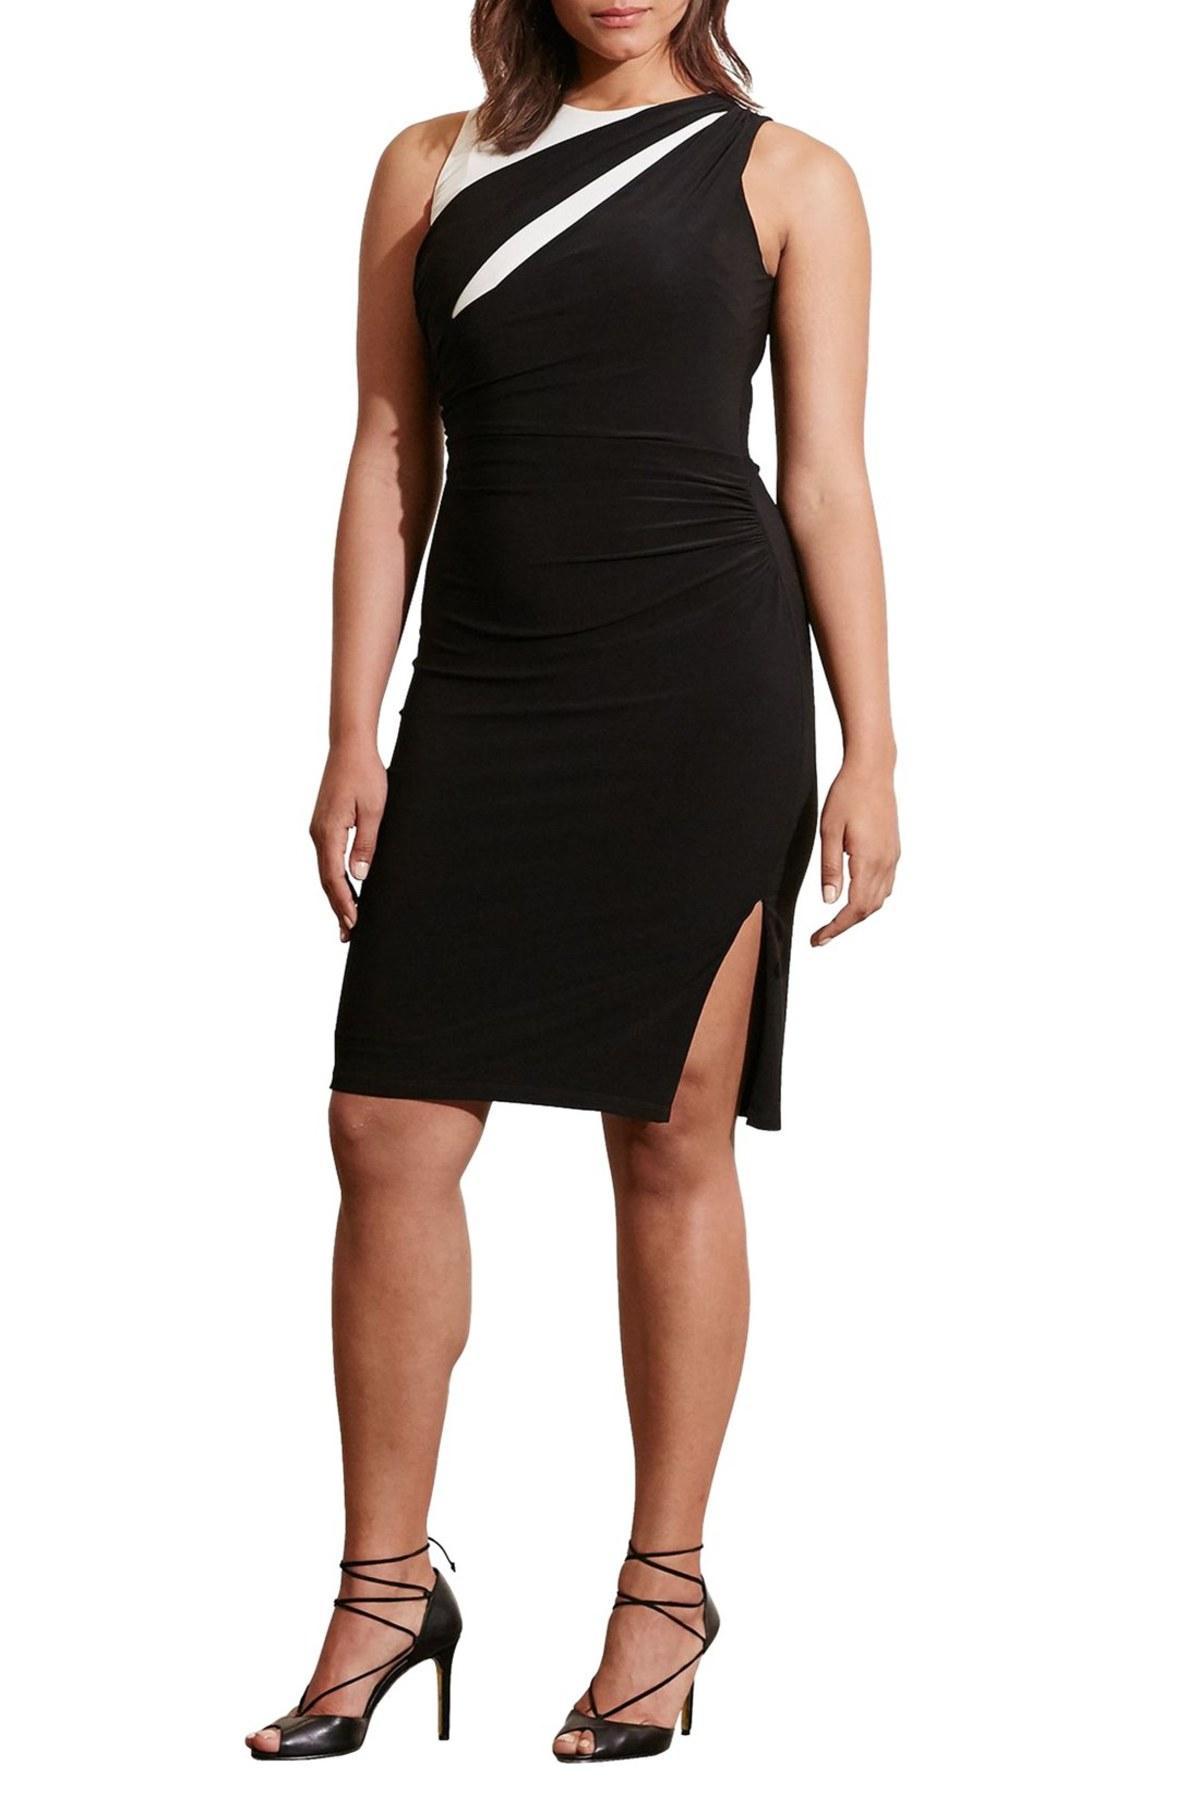 Lauren By Ralph Lauren Two Tone Side Ruched Jersey Dress